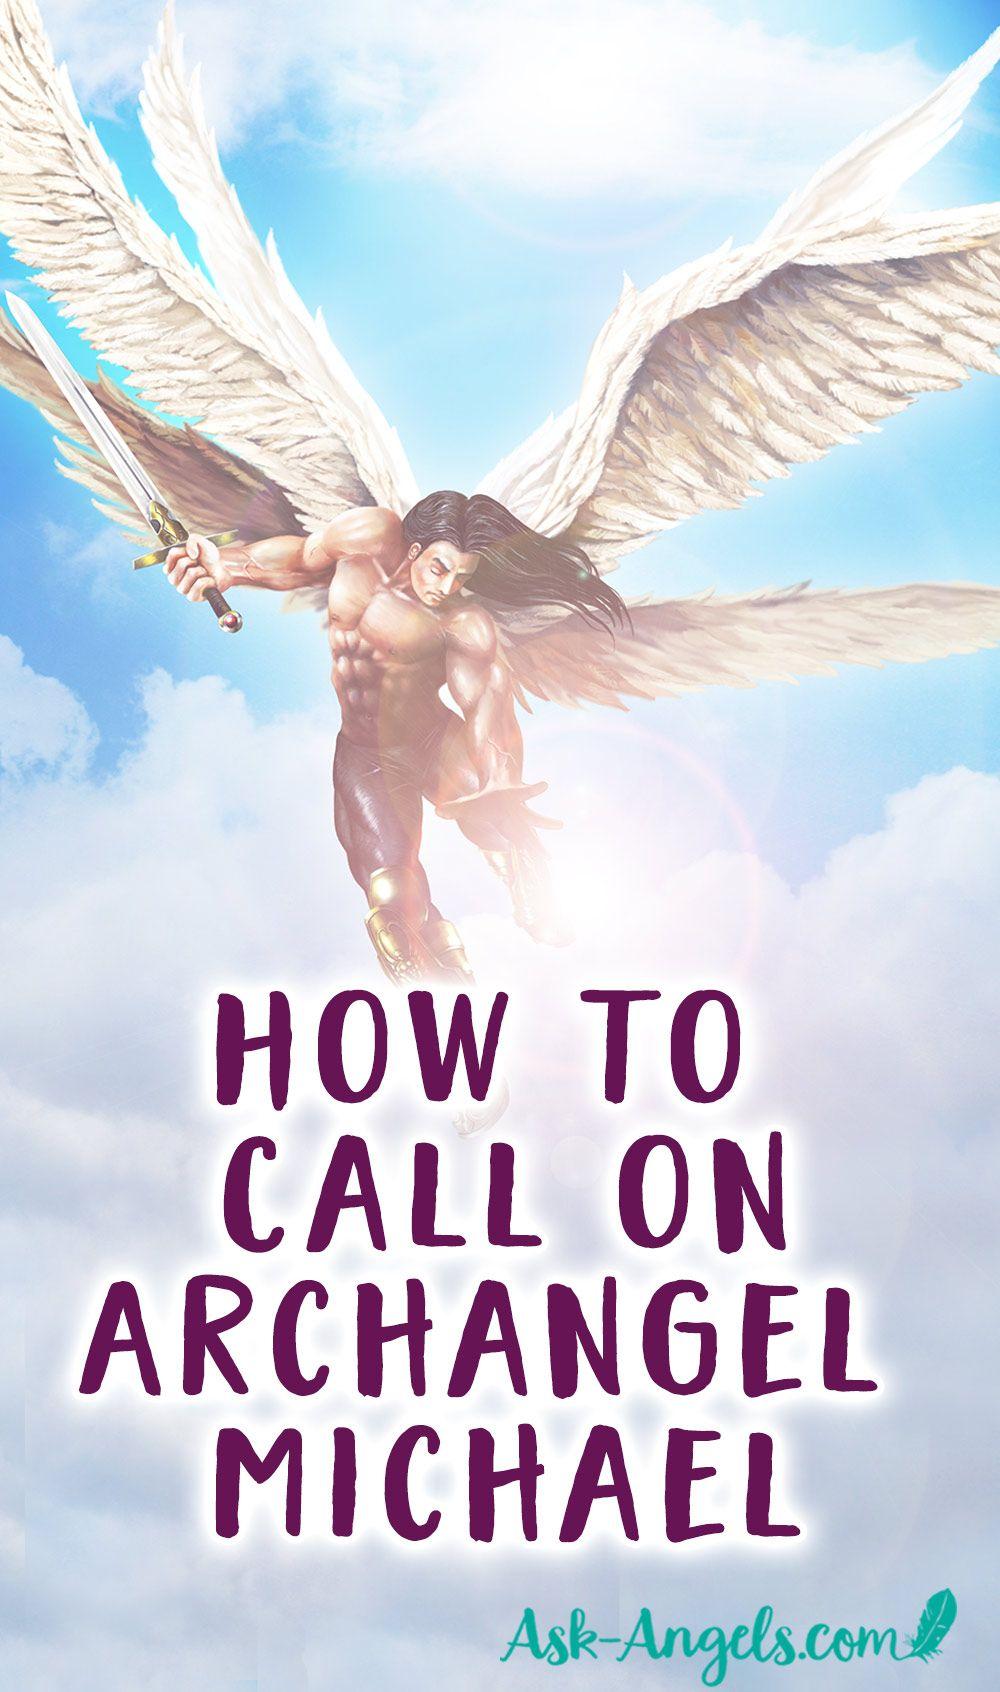 Meet Archangel Michael Strongest Archangel With Powers Of